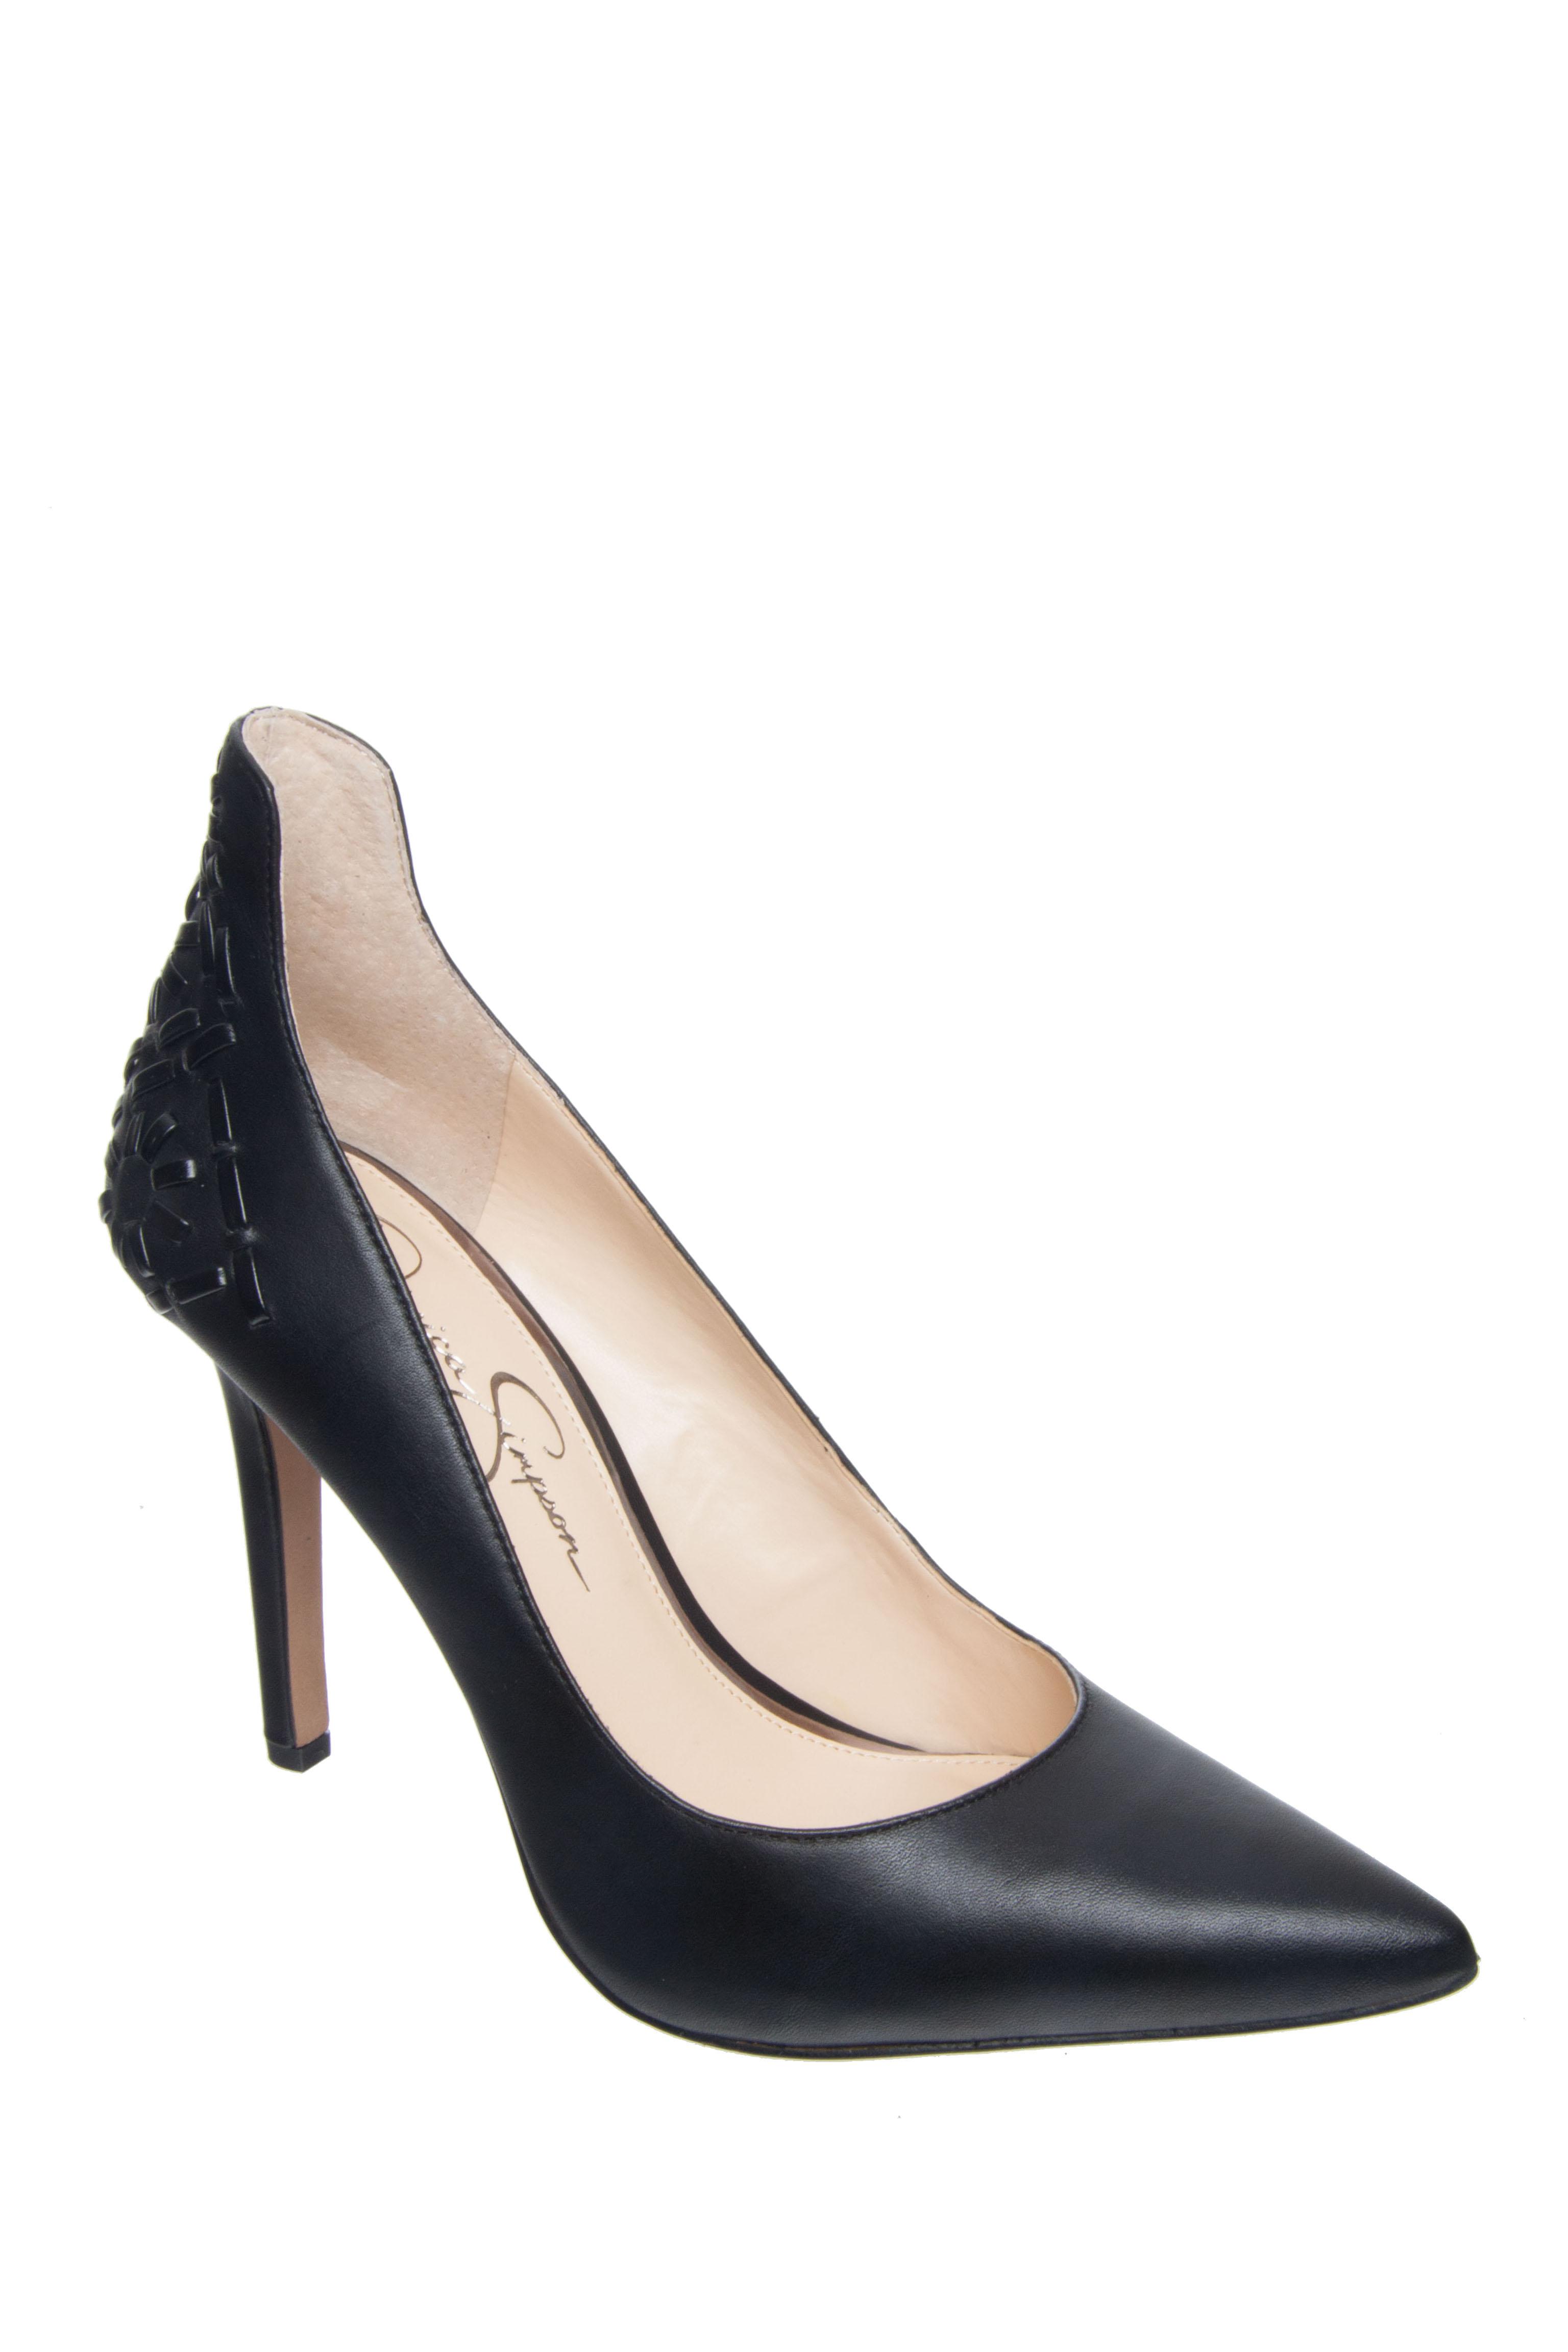 Jessica Simpson Crampell High Heels - Black